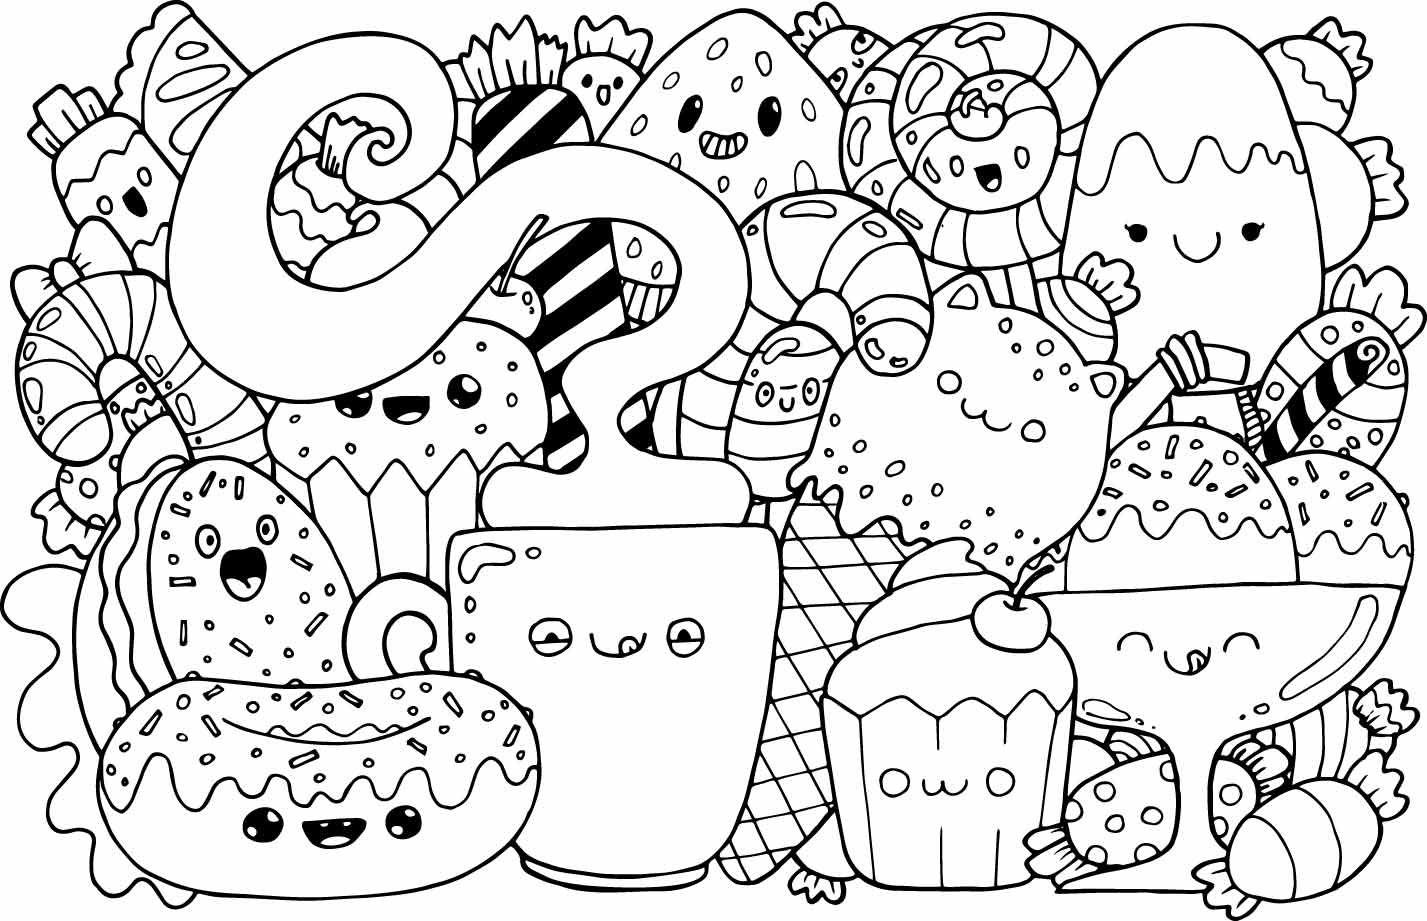 Comida Kawaii. Dibujos E Imagenes De Comidas Kawaii Para